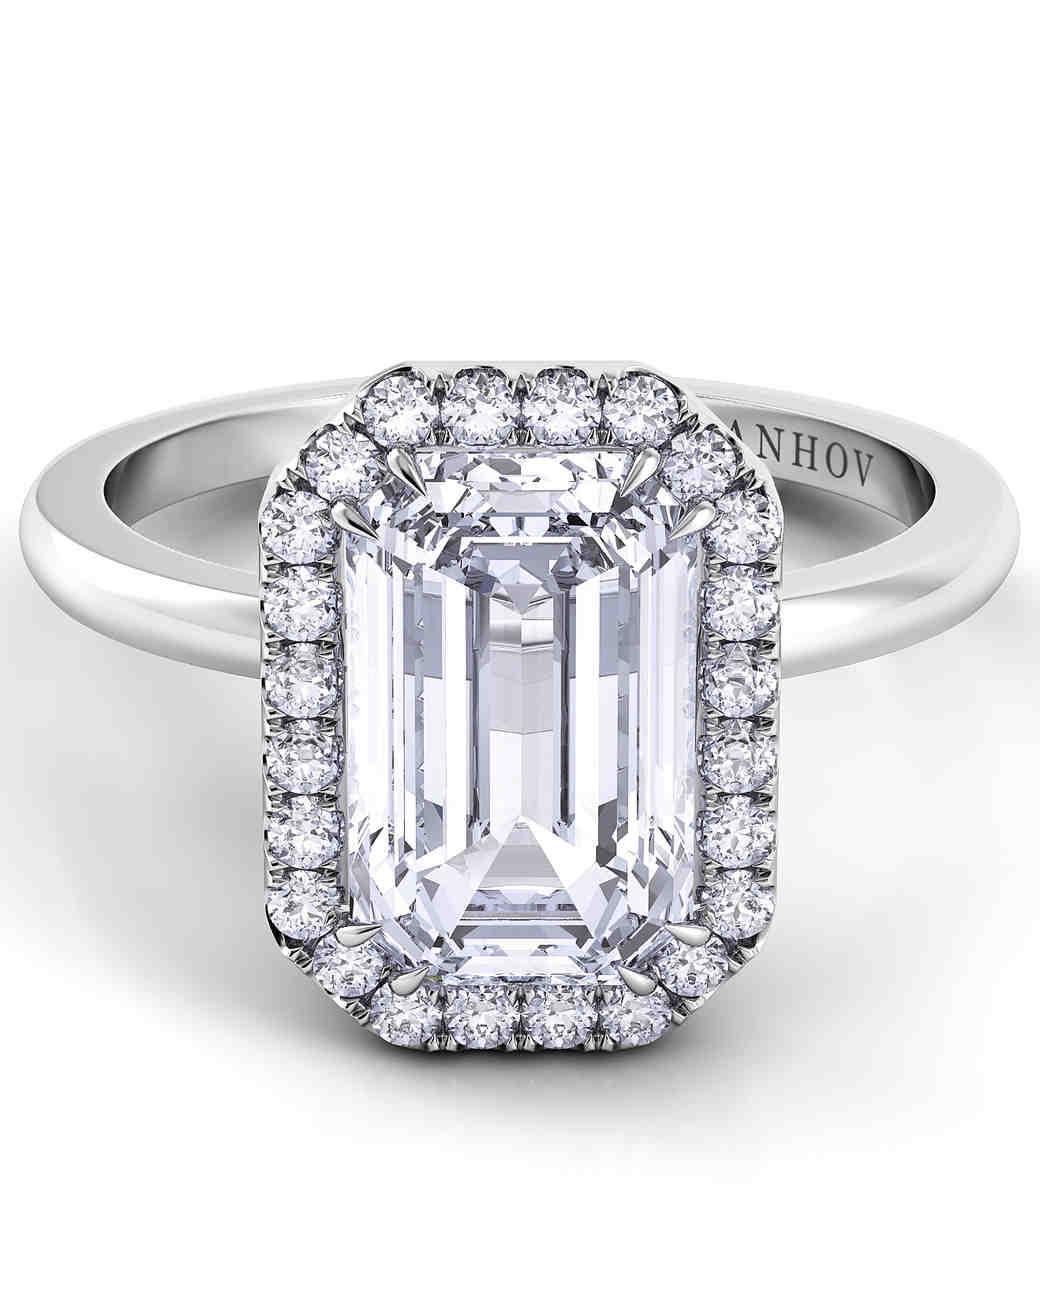 Danhov Emerald-Cut Engagement Ring